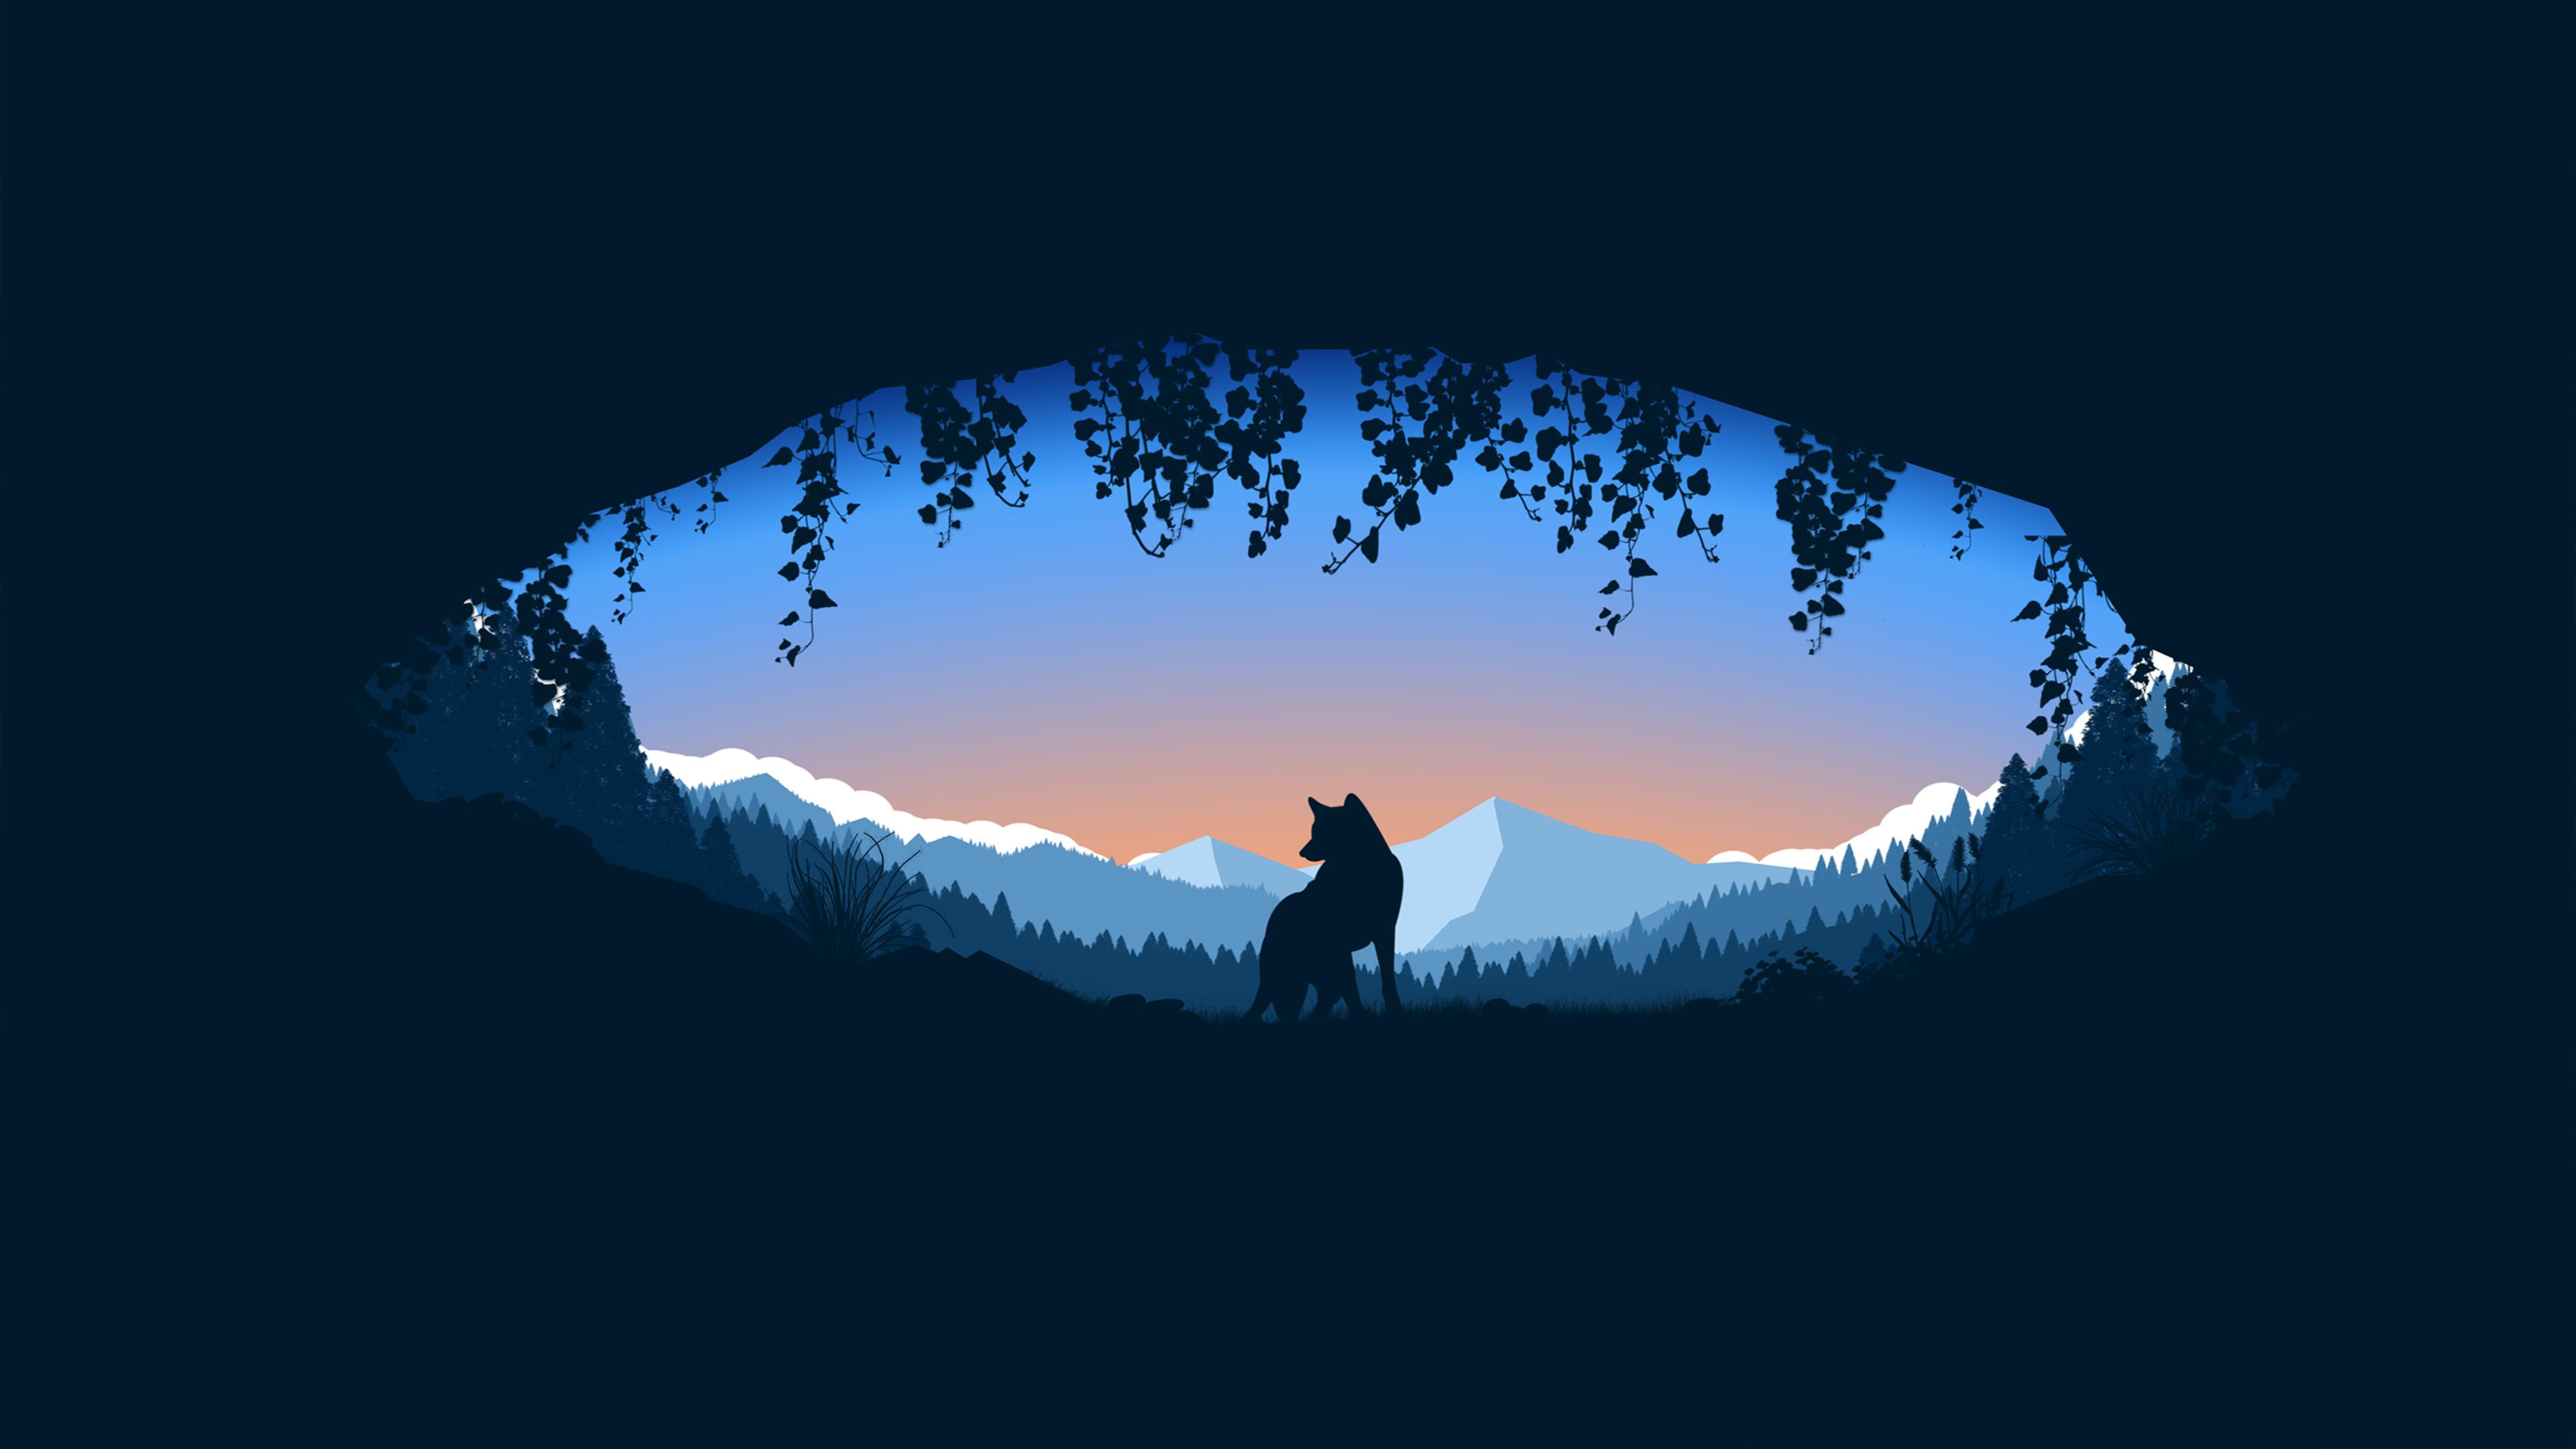 Wolf Cave Minimalist 4k wolf wallpapers, minimalist ...